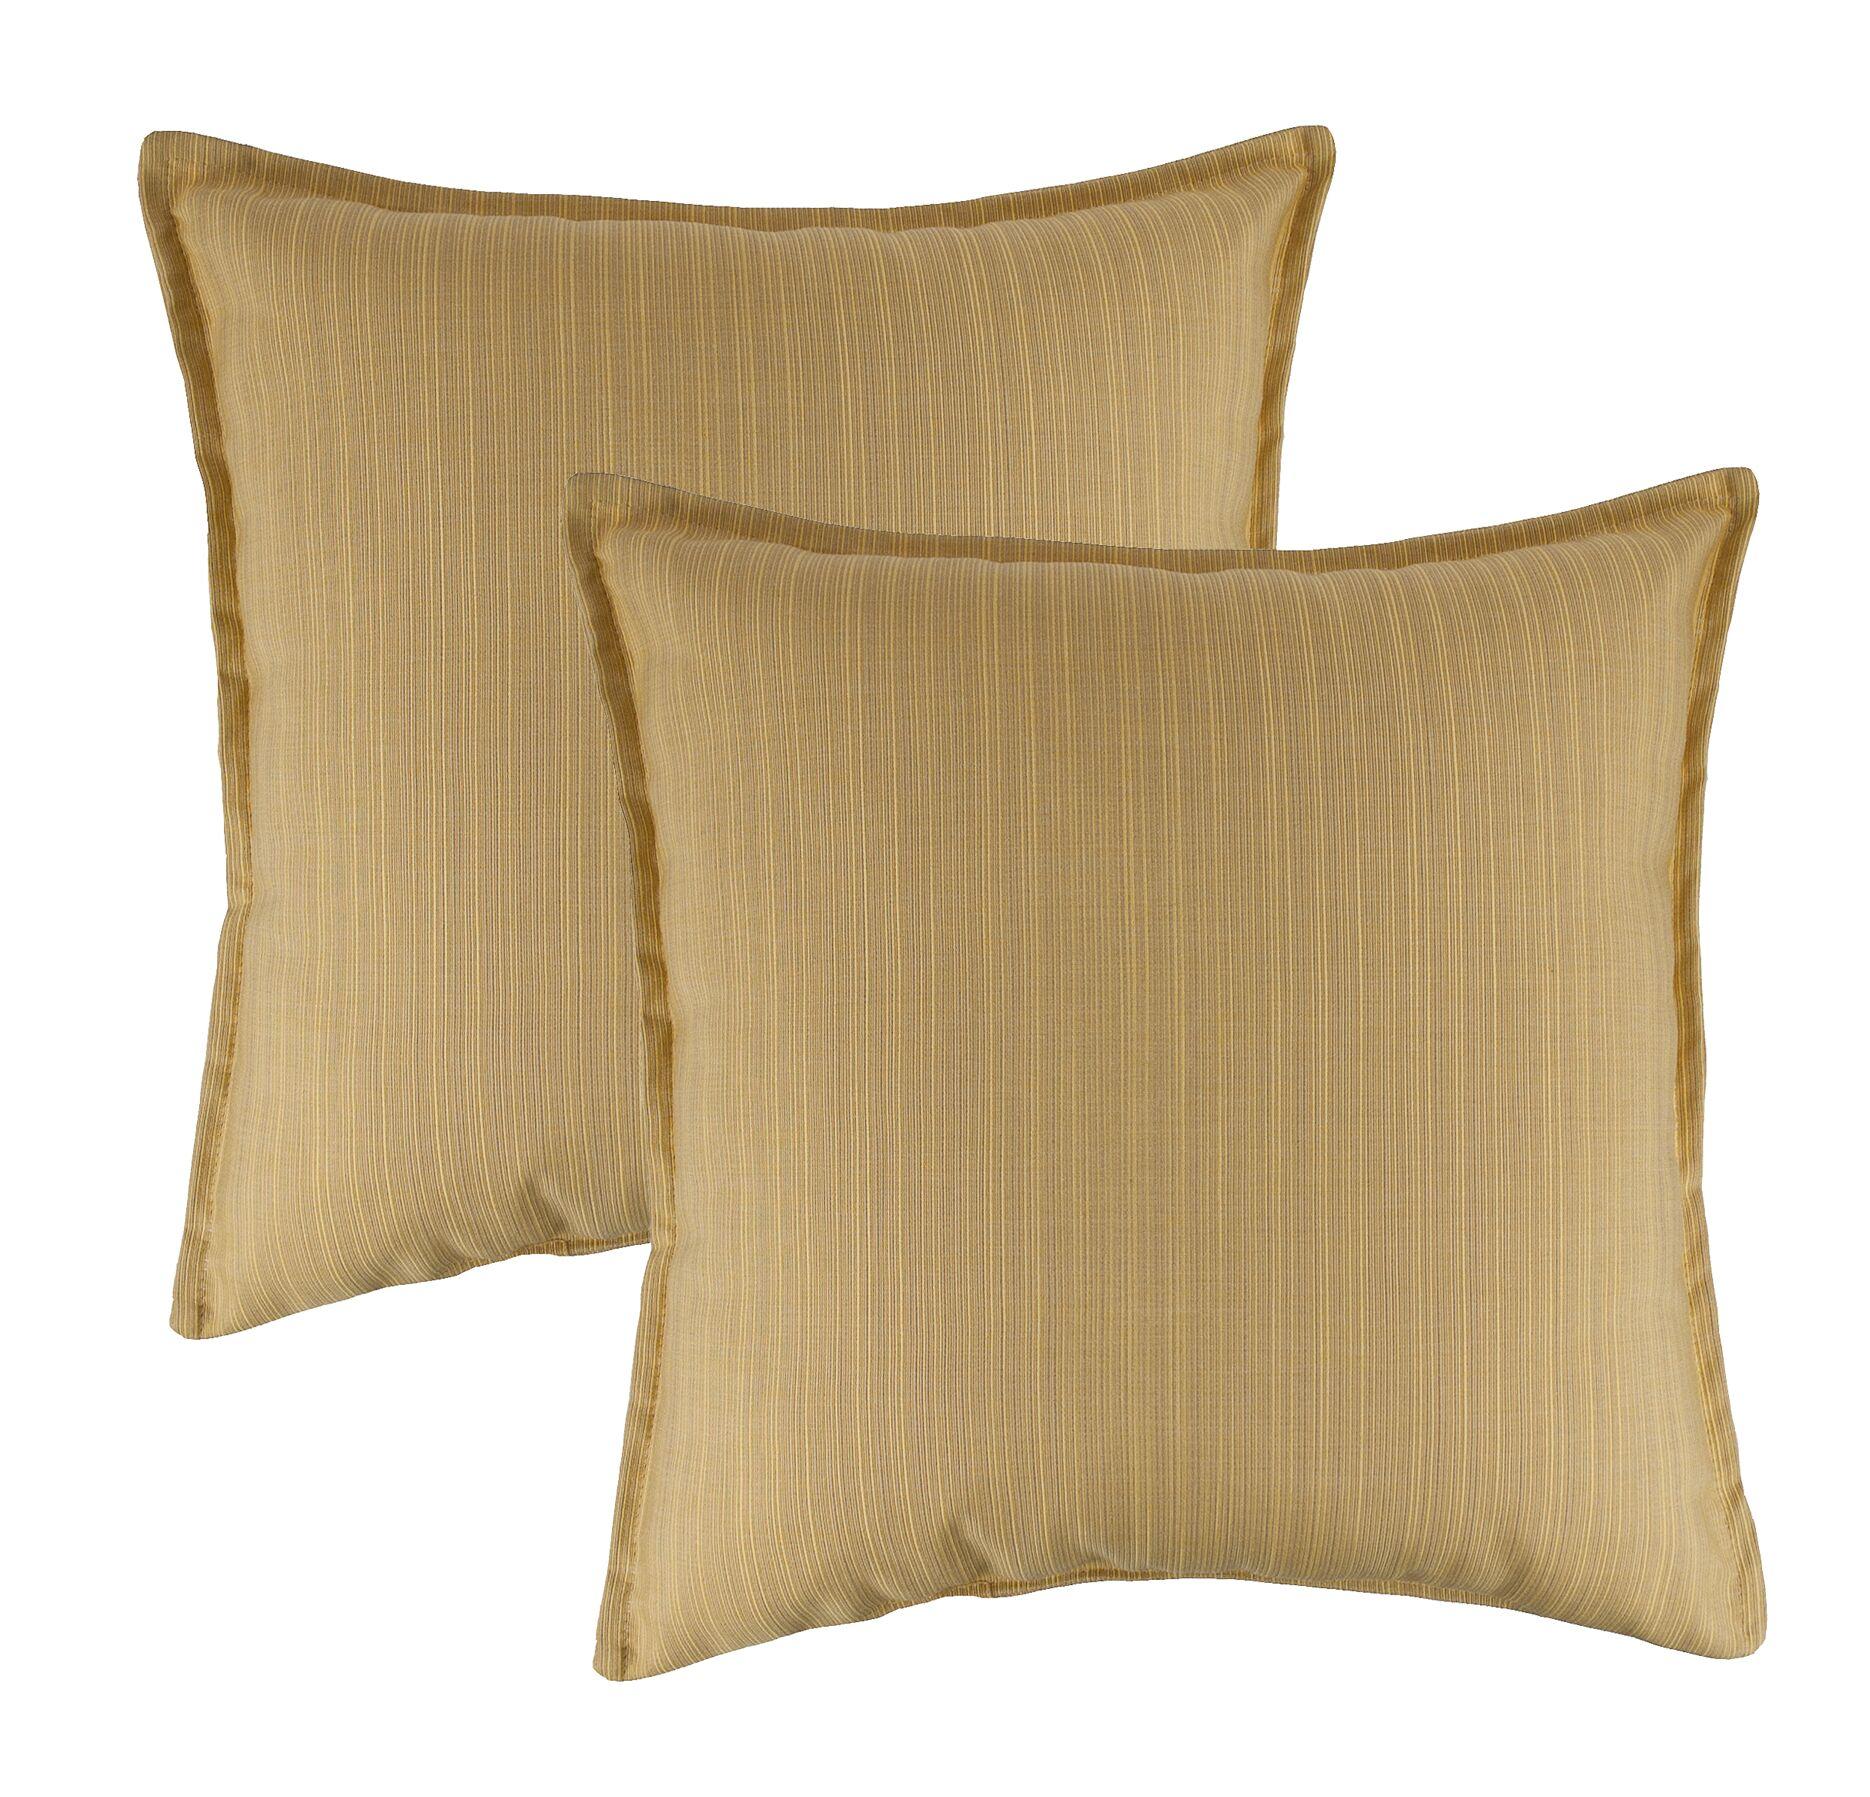 Dupione Outdoor Sunbrella Throw Pillow